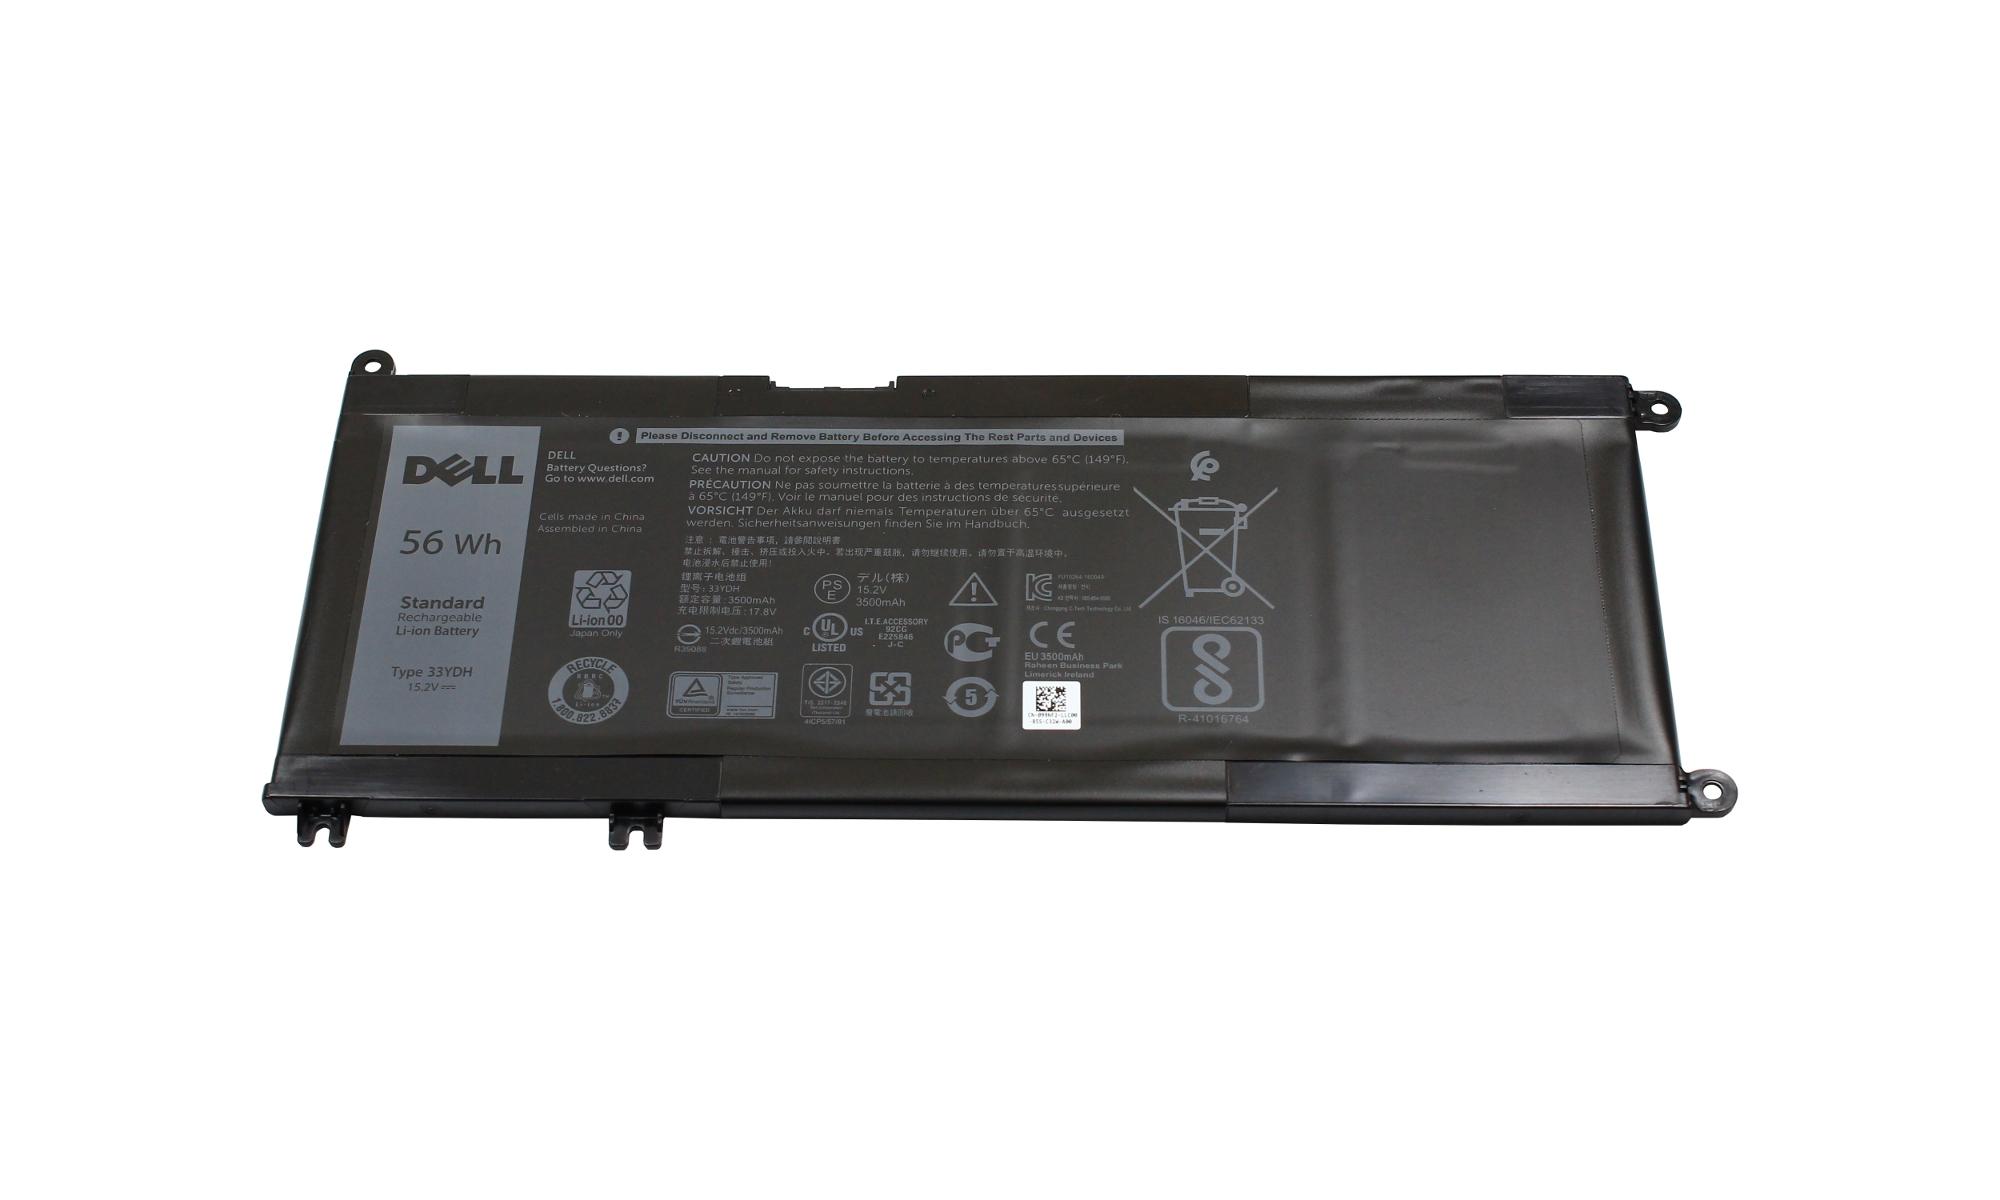 Baterie originala Dell Inspiron G7 7588, 56Wh 4 celule